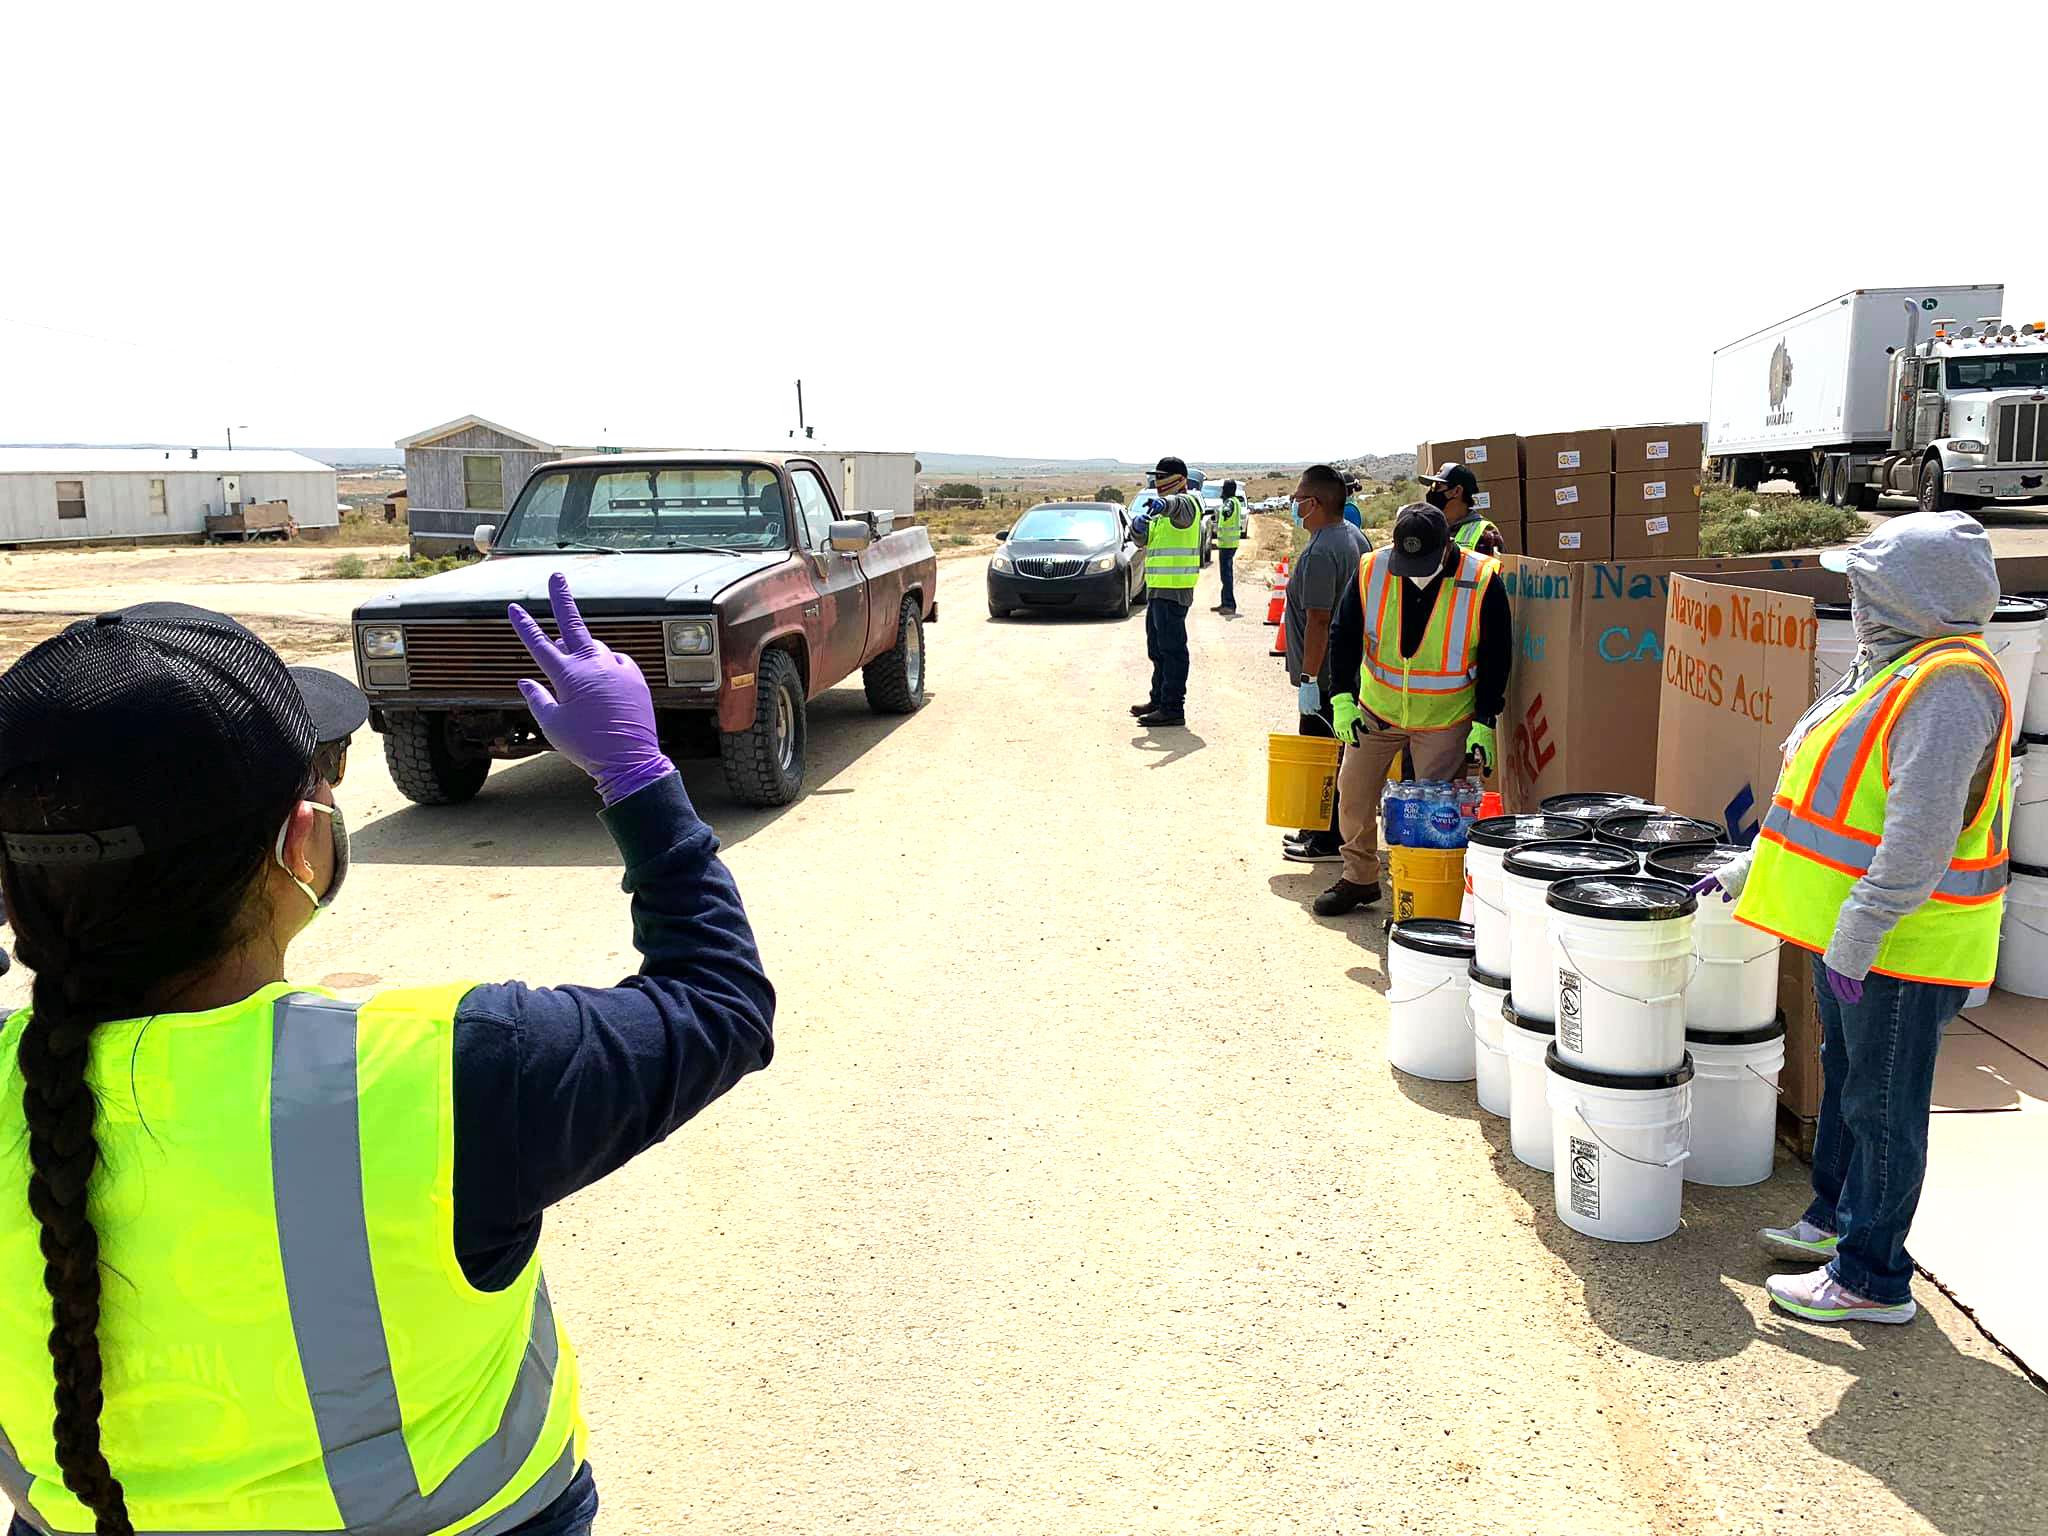 Navajo Nation To Participate In Pfizer Biontech Covid 19 Vaccine Trial Navajo Hopi Observer Navajo Hopi Nations Az